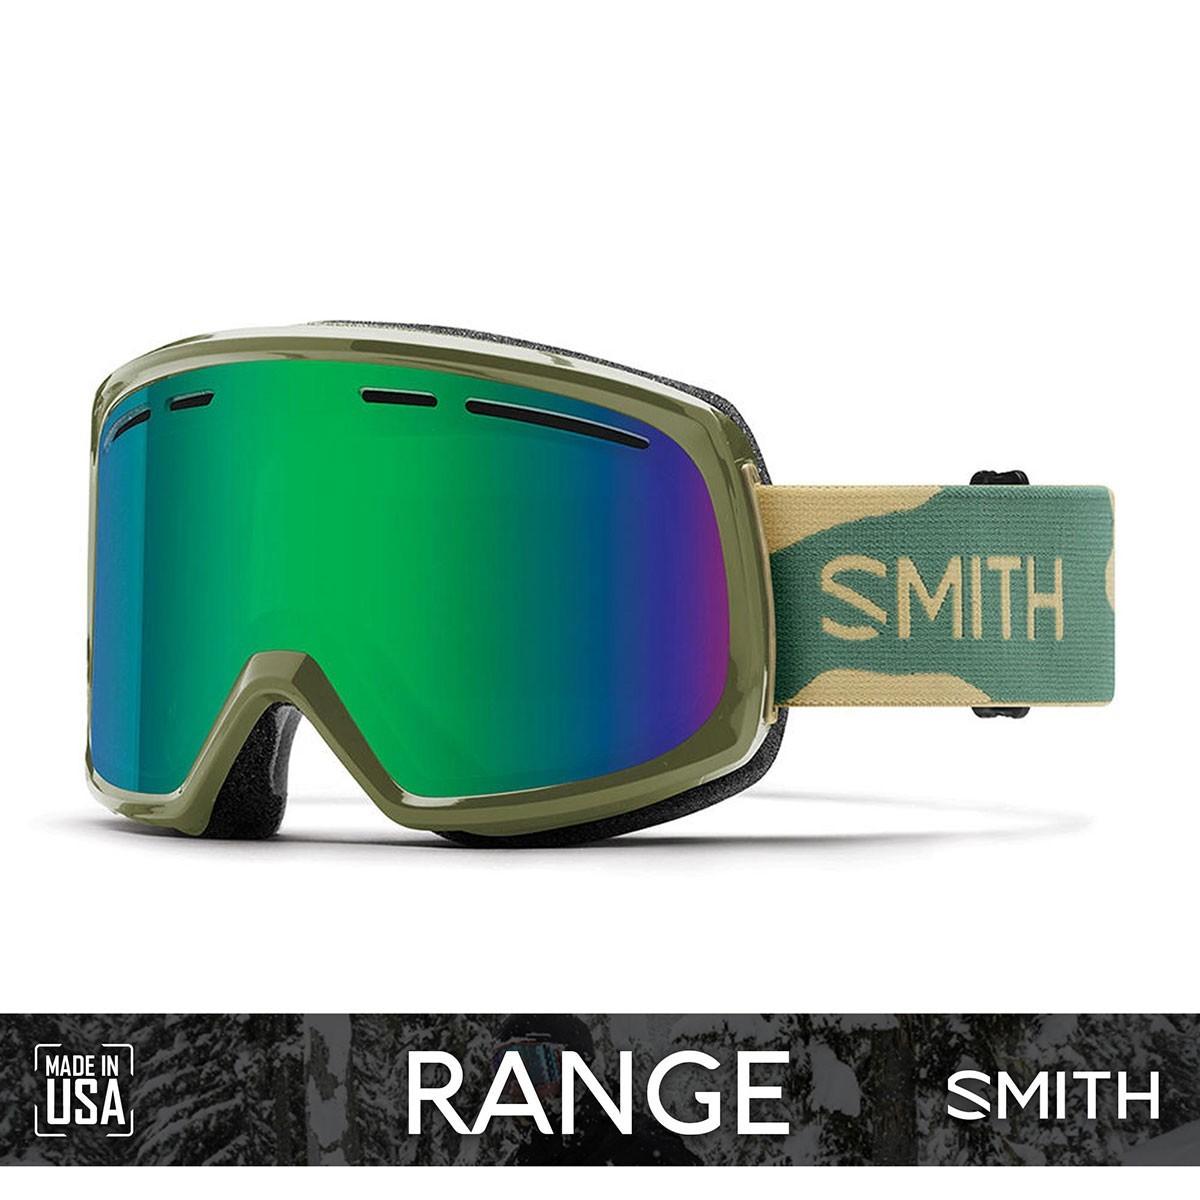 SMITH RANGE Camo | S3 GREEN SOL-X Mirror - Изображение - AQUAMATRIX